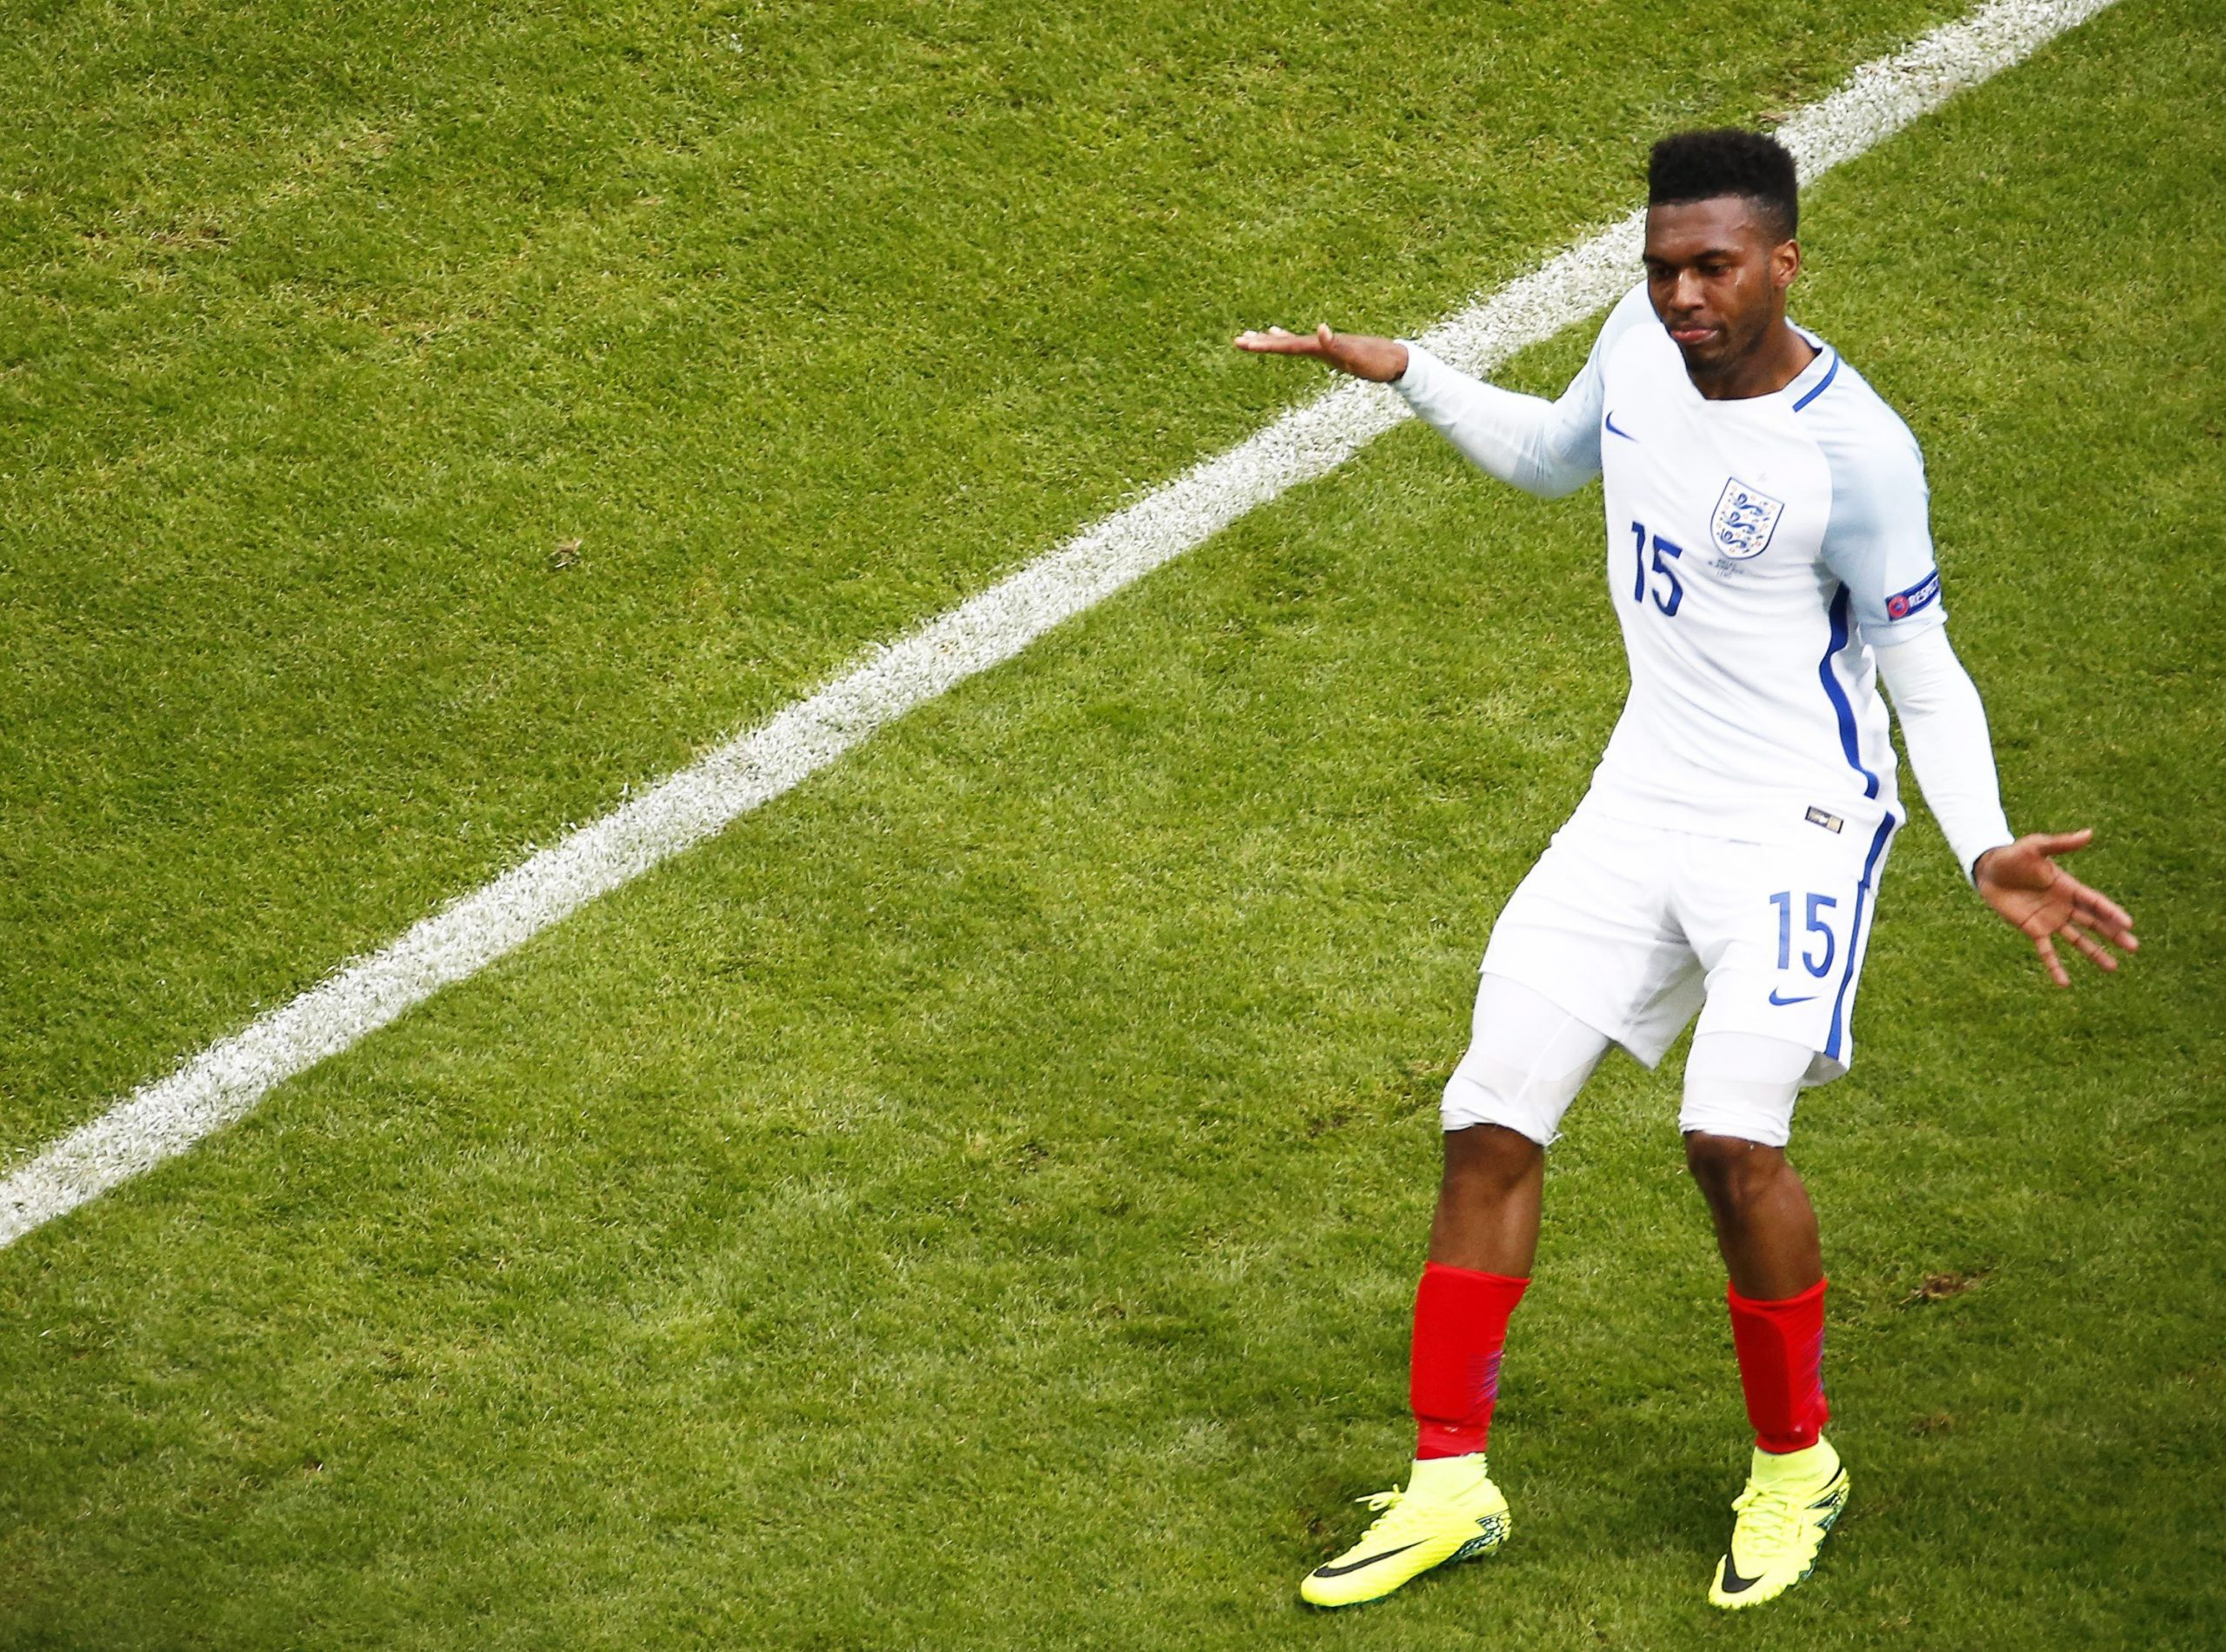 Sturridge celebrando un gol con Inglaterra.